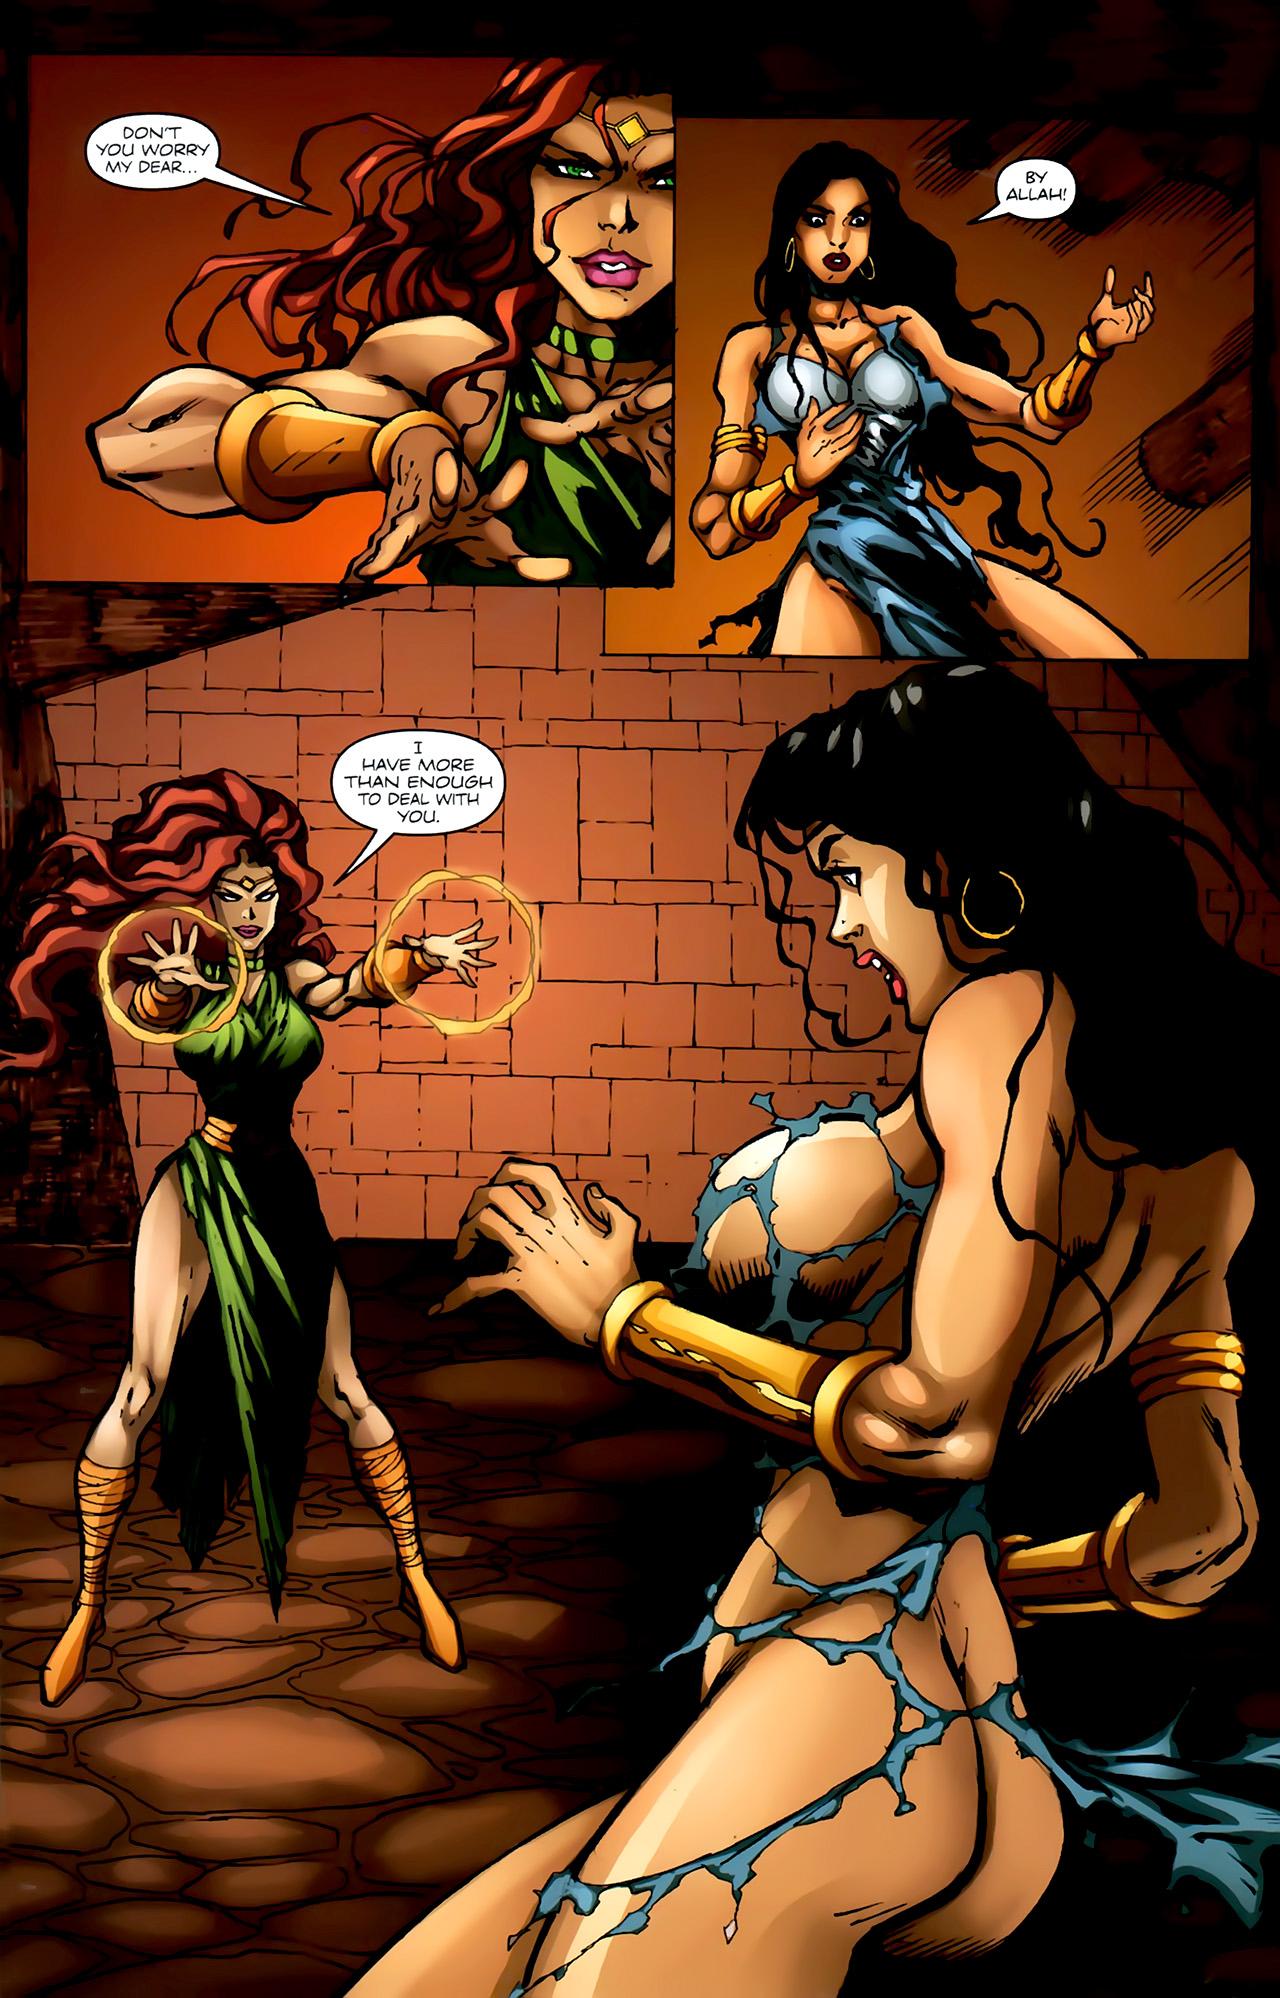 Read online 1001 Arabian Nights: The Adventures of Sinbad comic -  Issue #4 - 20